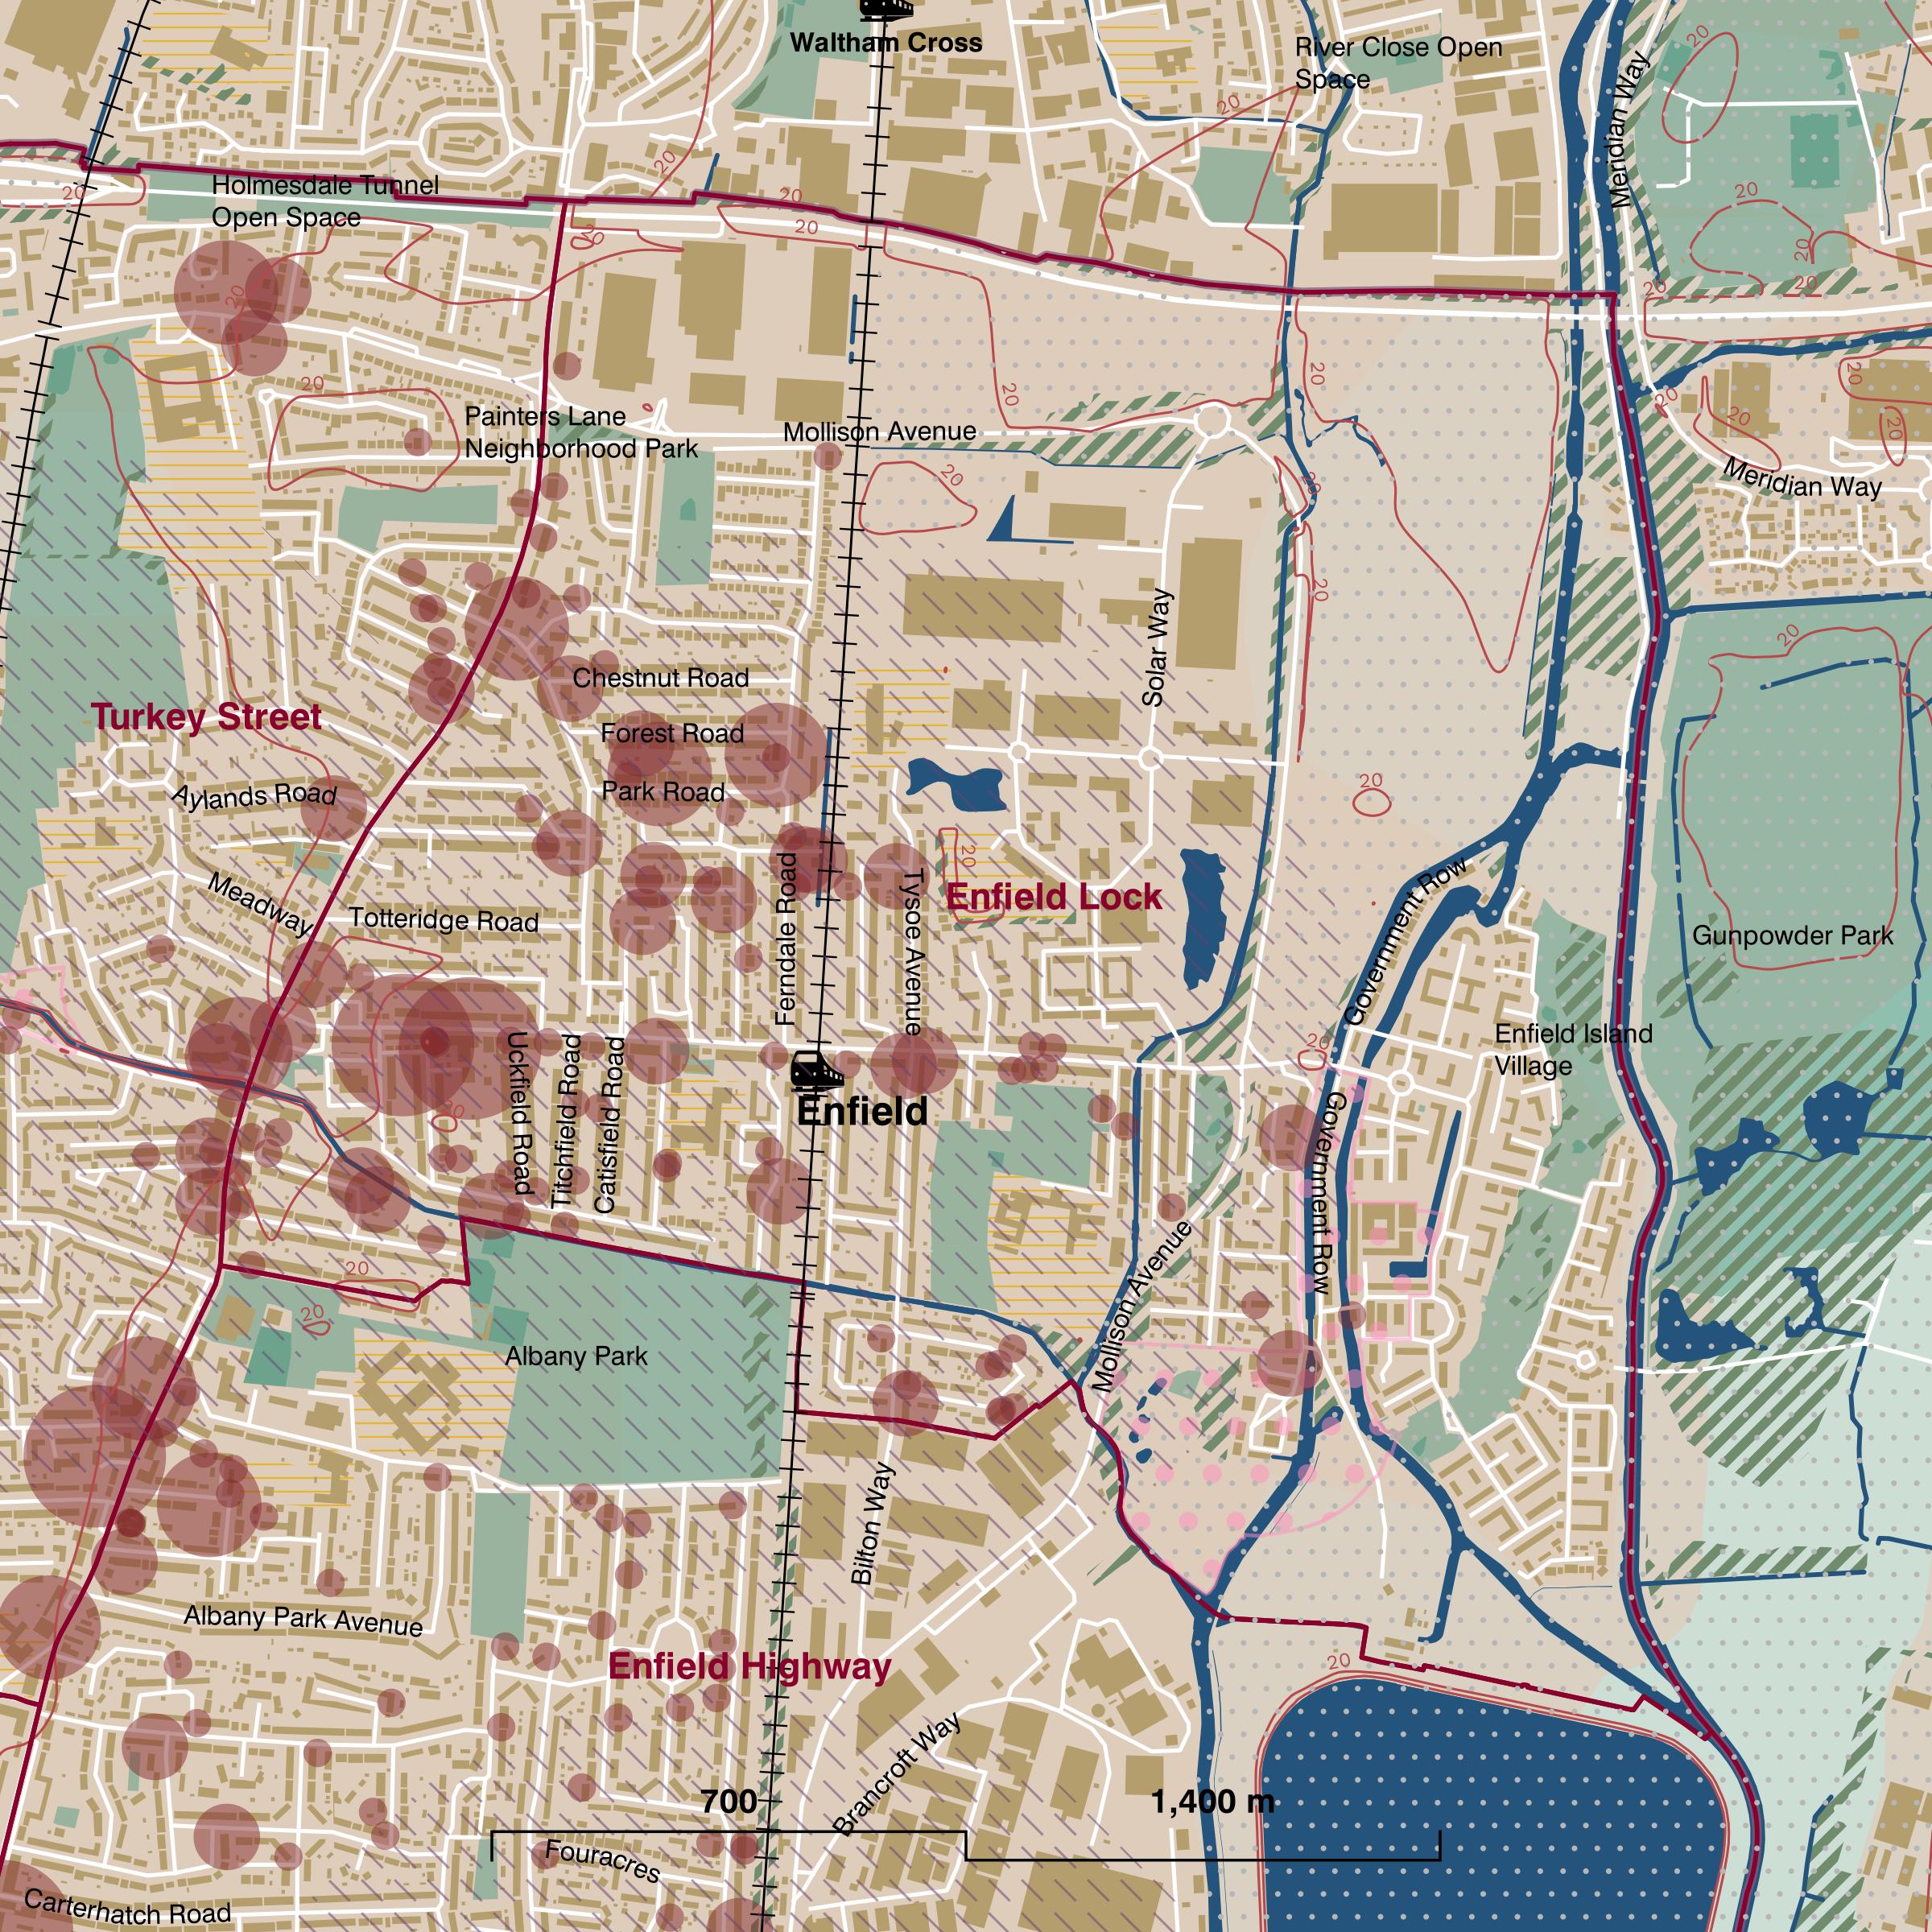 Map of Enfield Lock ward